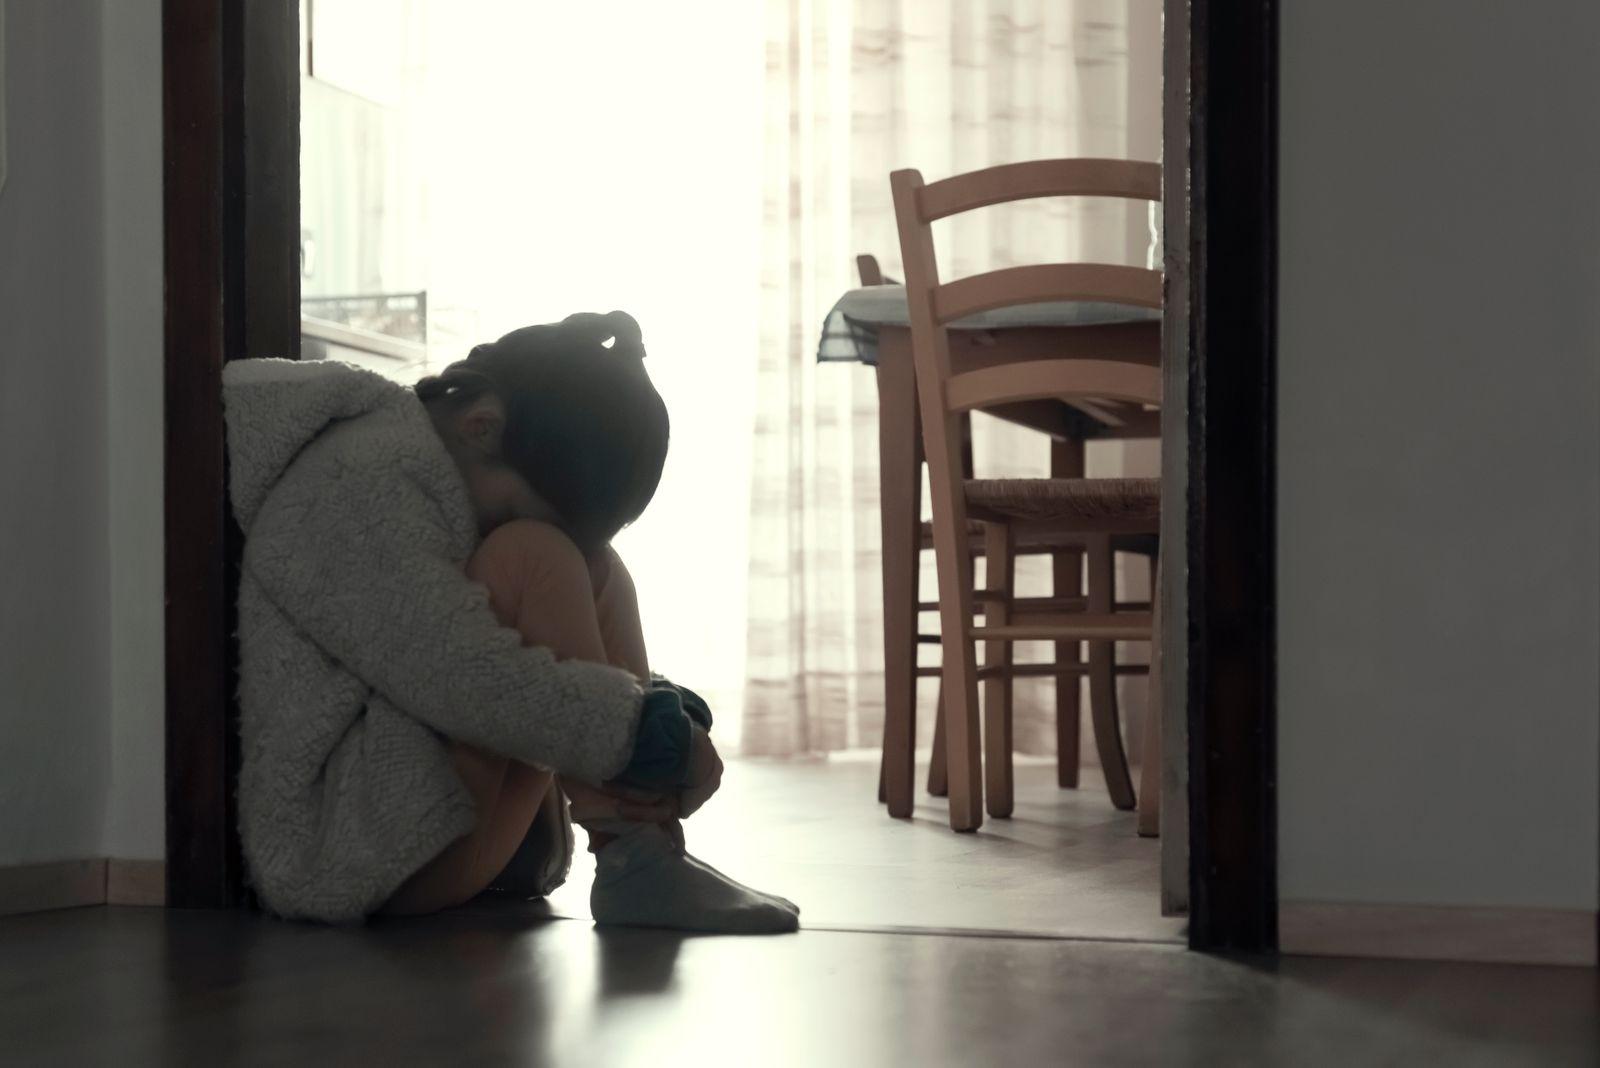 Depressed little girls